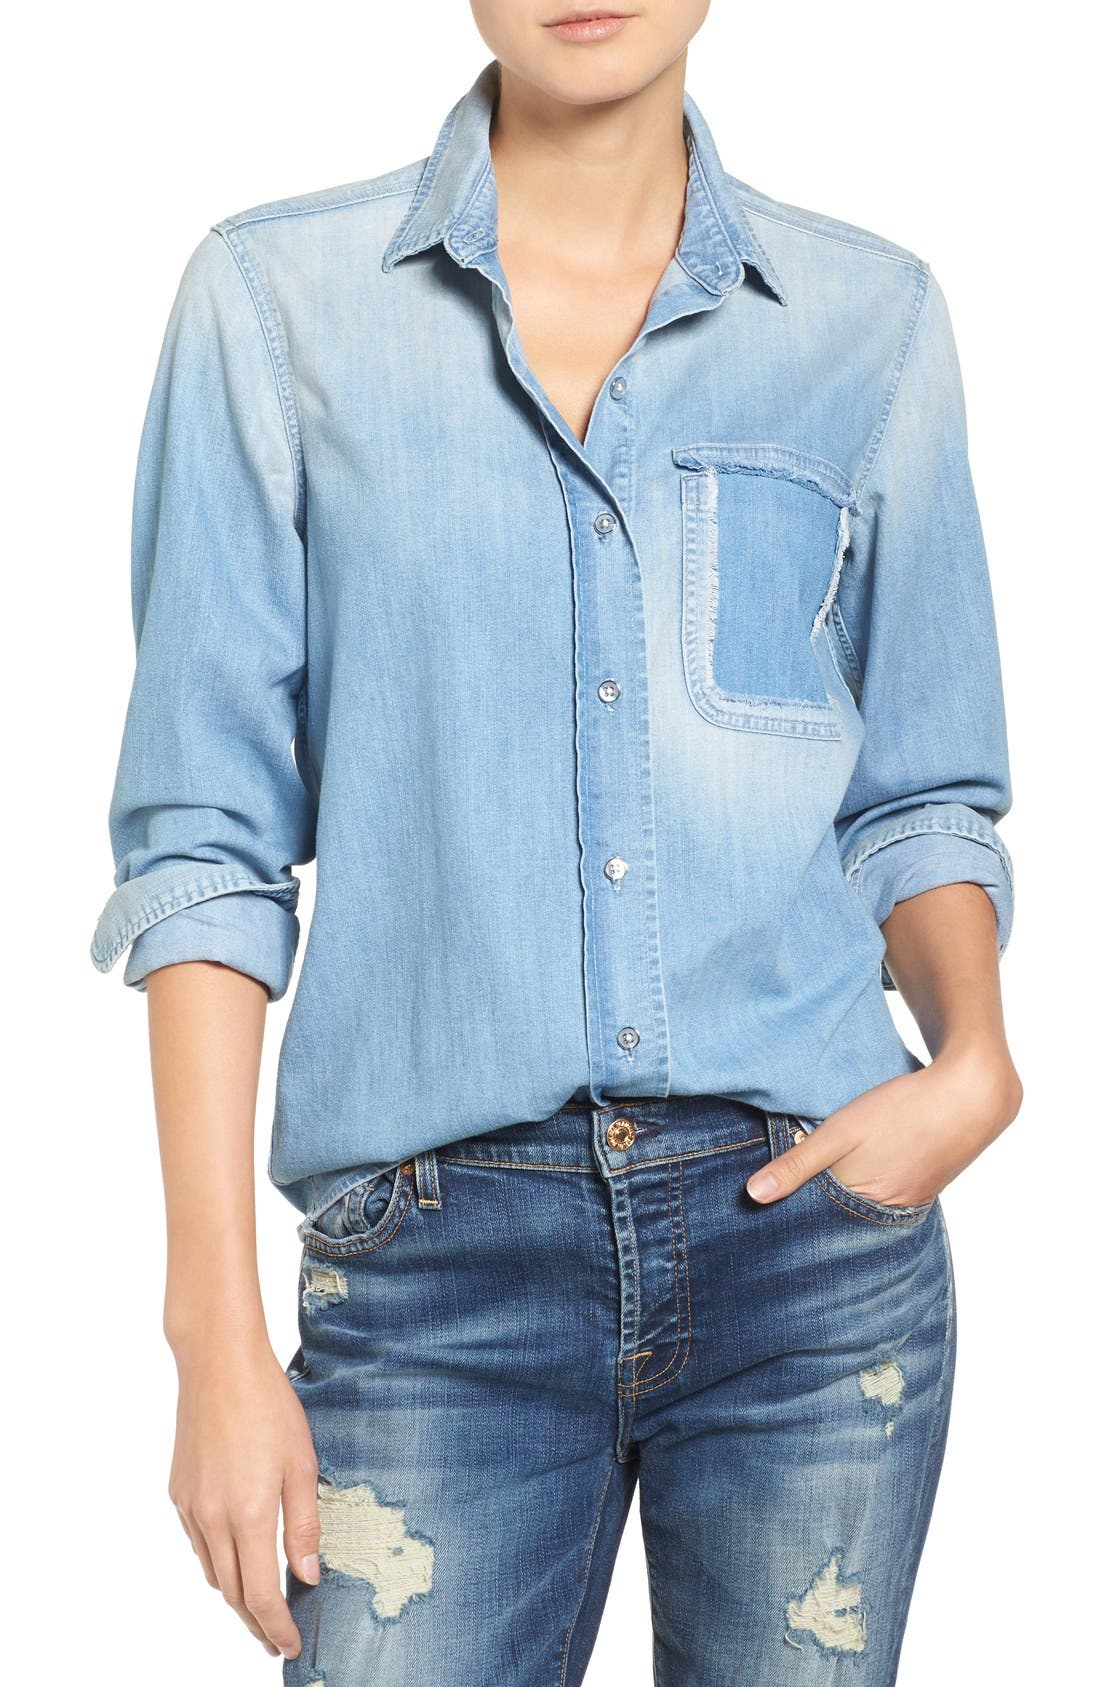 Alternate Image 1 Selected - 7 For All Mankind® Torn Pocket Denim Boyfriend Shirt